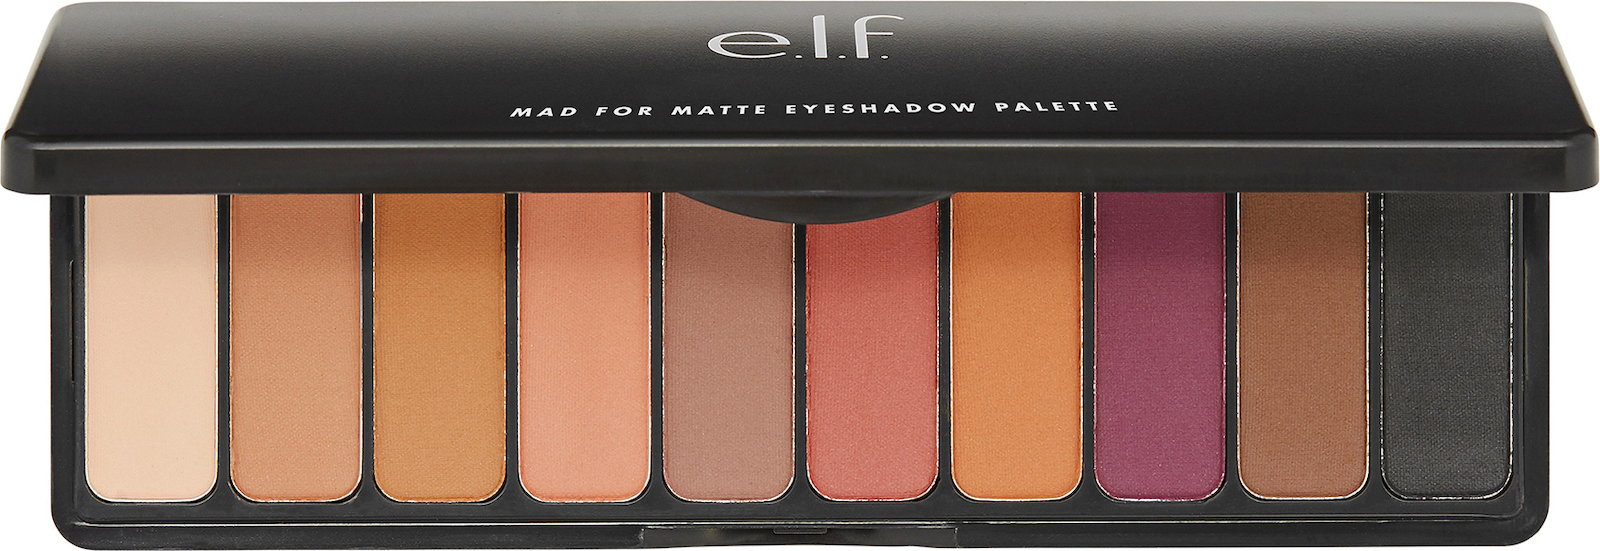 ELF COSMETICS Mad for Matte Eyeshadow Palette » Info